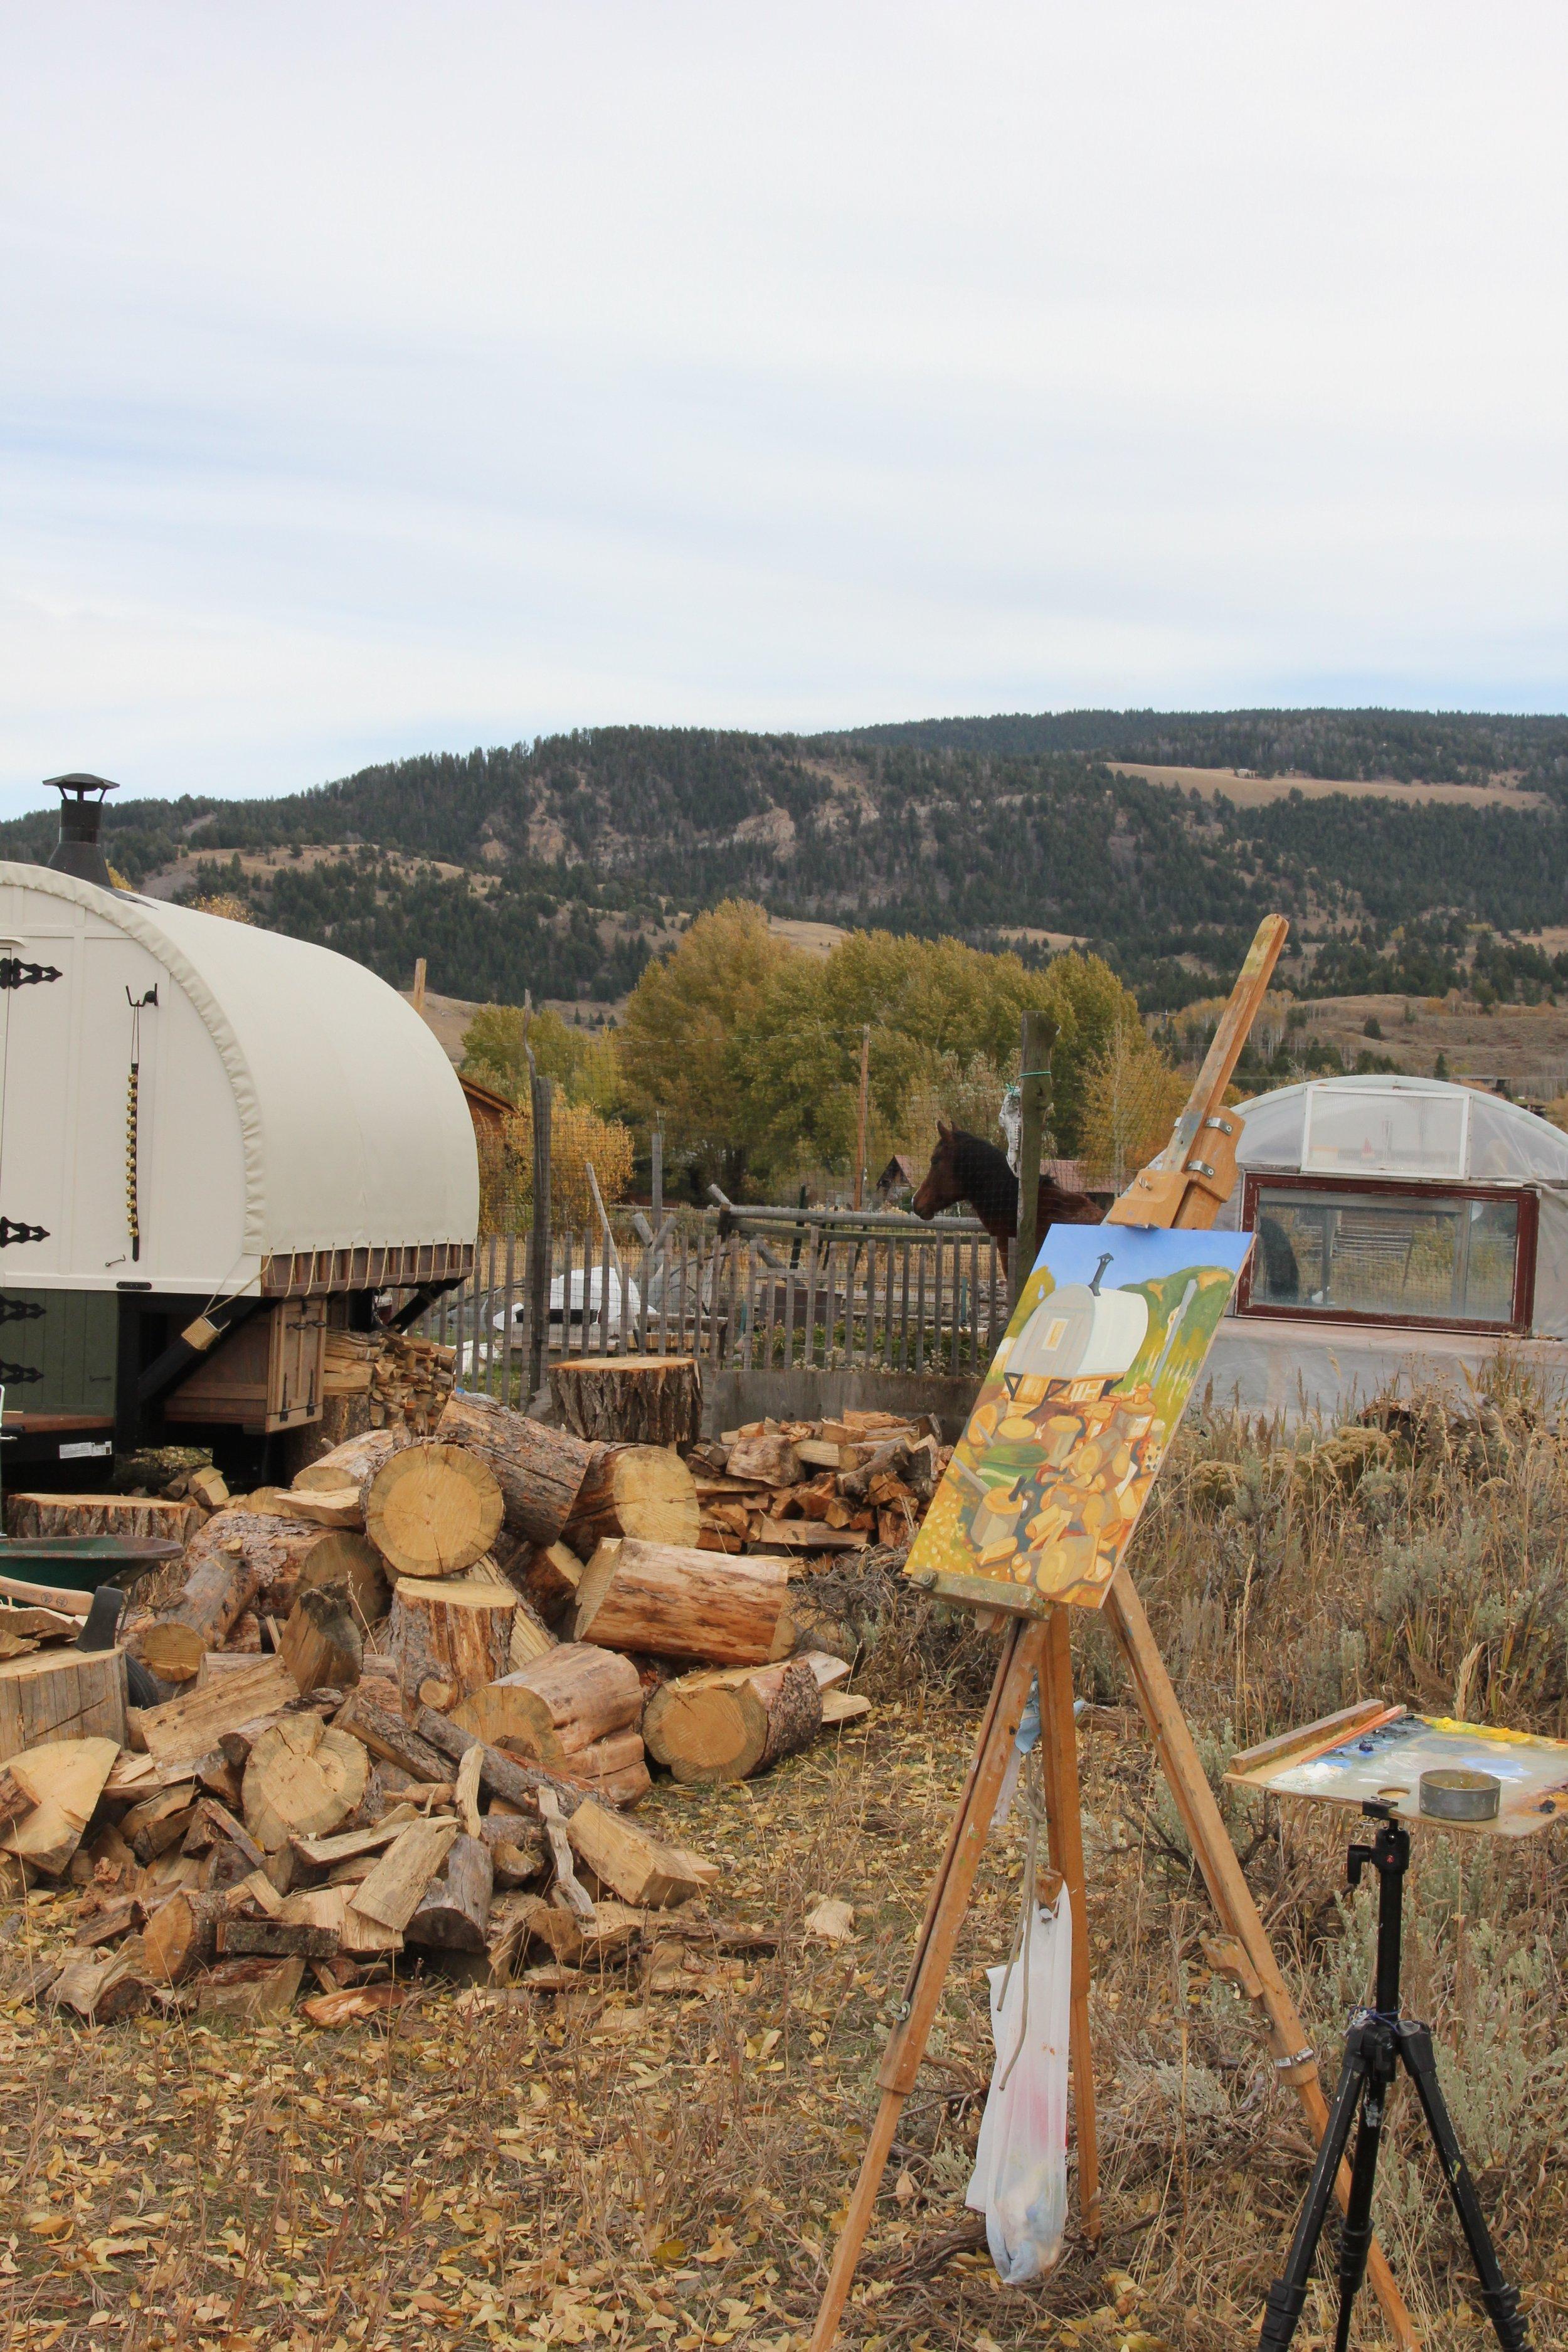 In-progress by Wendell Field outside the Sheep Wagon.